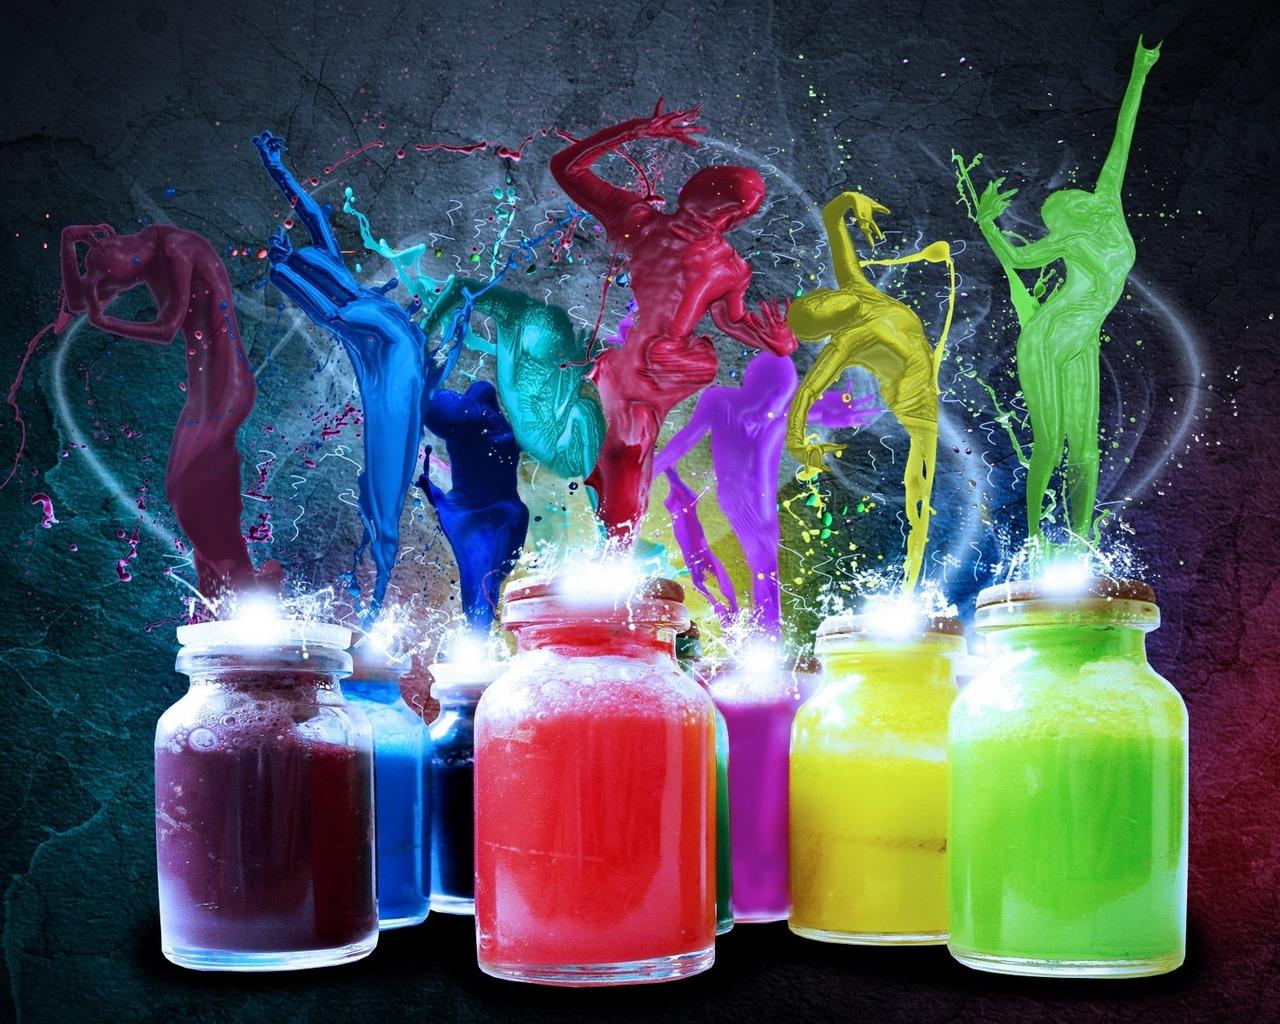 http://2.bp.blogspot.com/-dXo9CCZM_Bs/TvBkTg96n9I/AAAAAAAADiM/XTaG_txVTDo/s1600/Funky-Frisky-Grafitti-Wallpapers-54.jpg